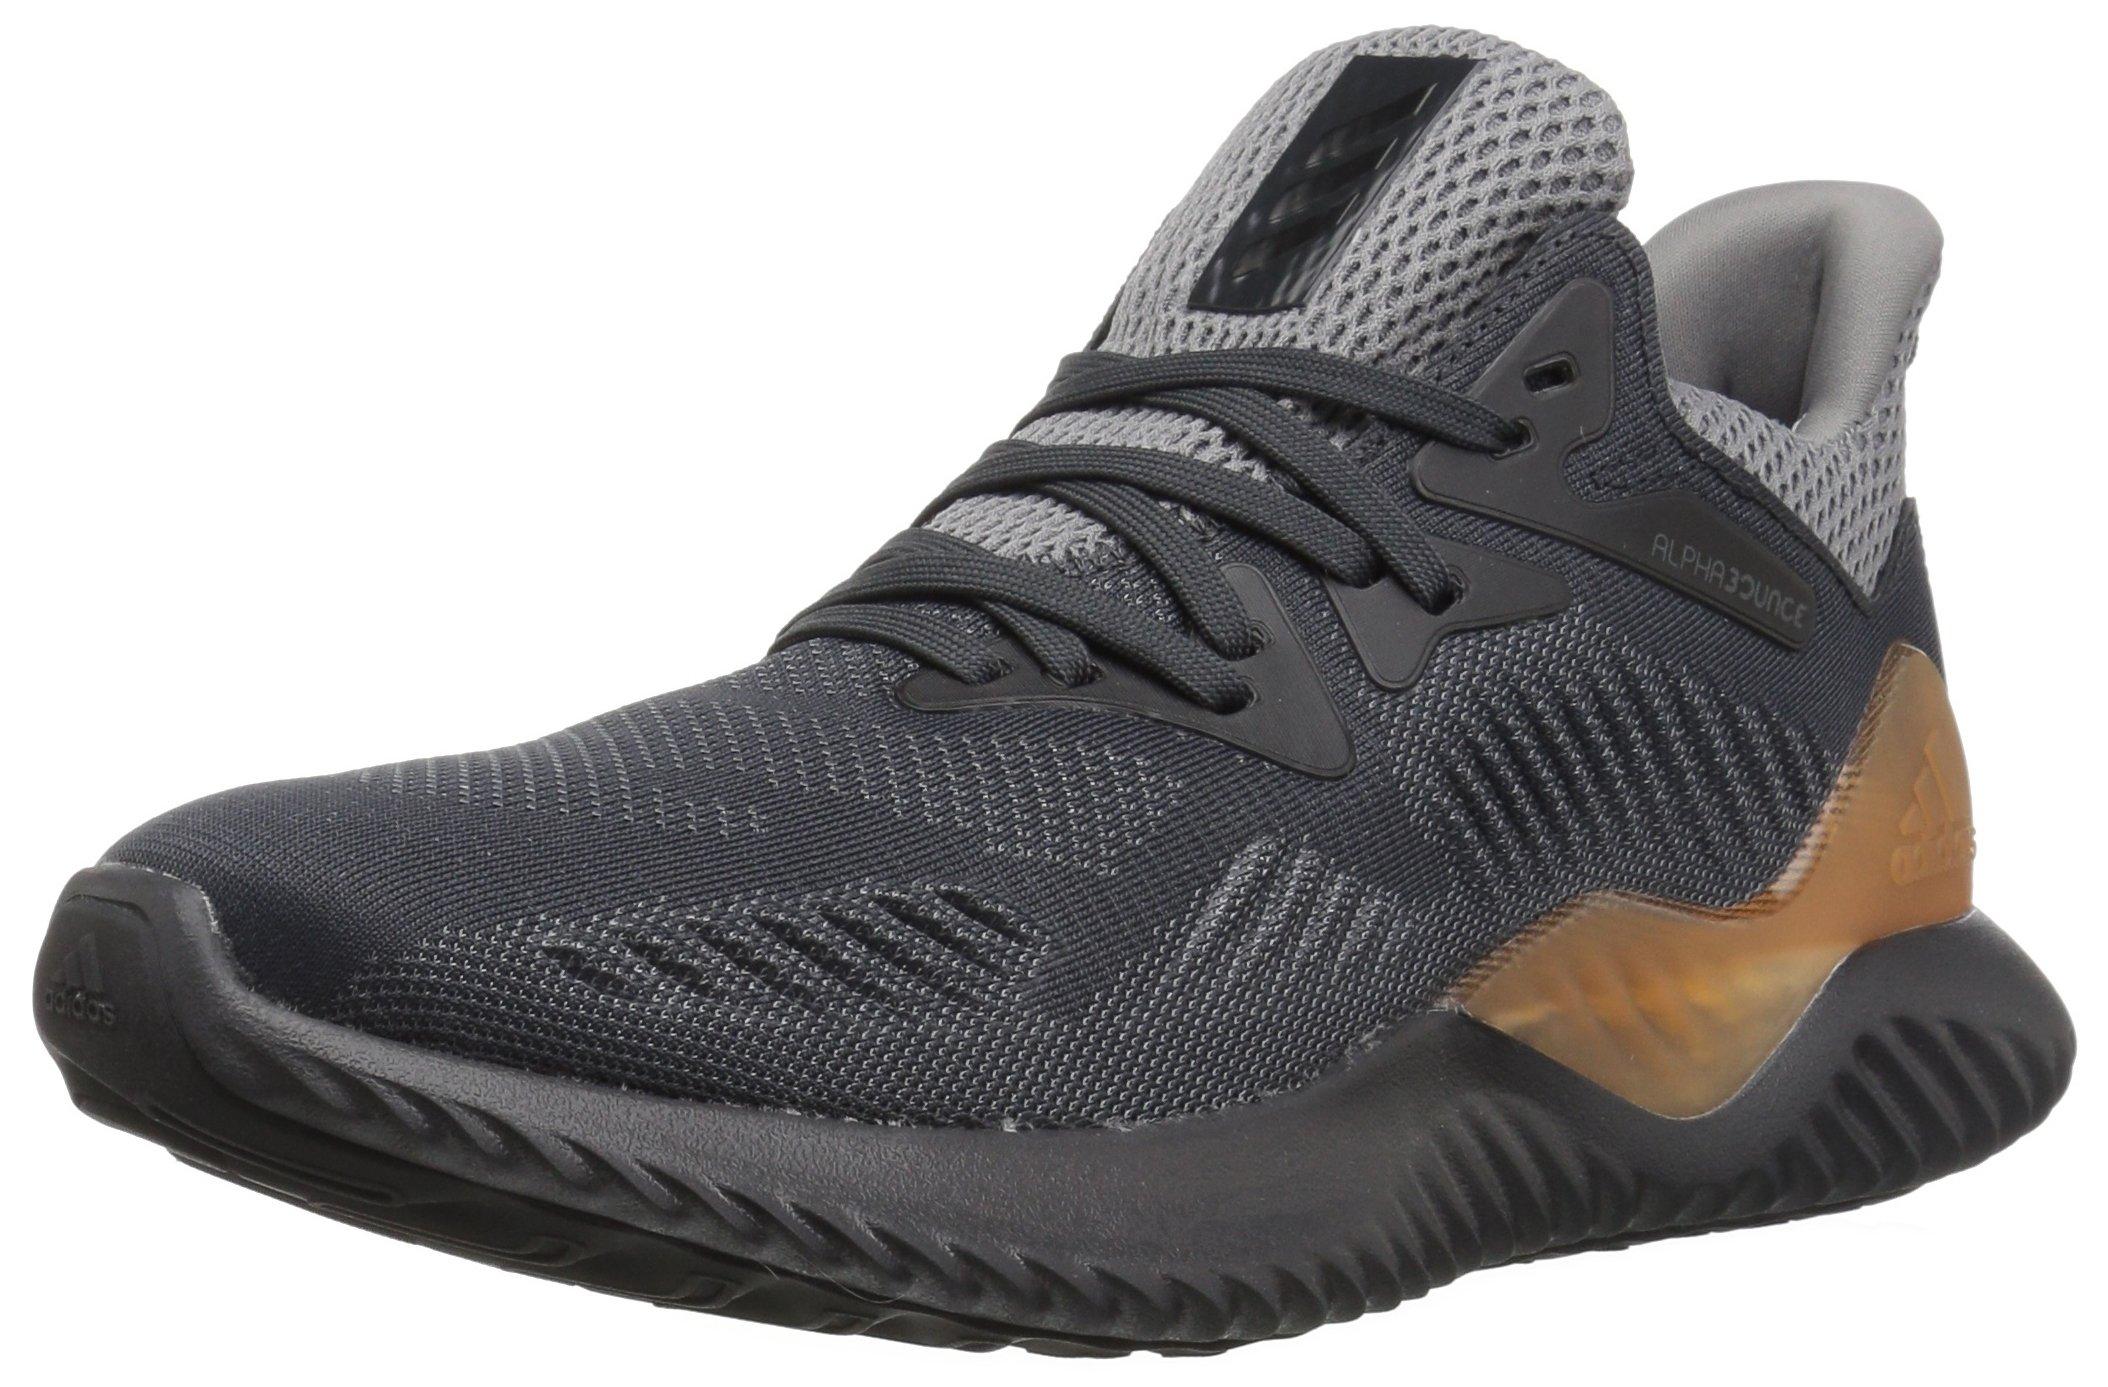 adidas Performance Unisex-Kids Alphabounce Beyond j, Grey Four/Carbon/Dark Solid Grey, 5 Medium US Big Kid